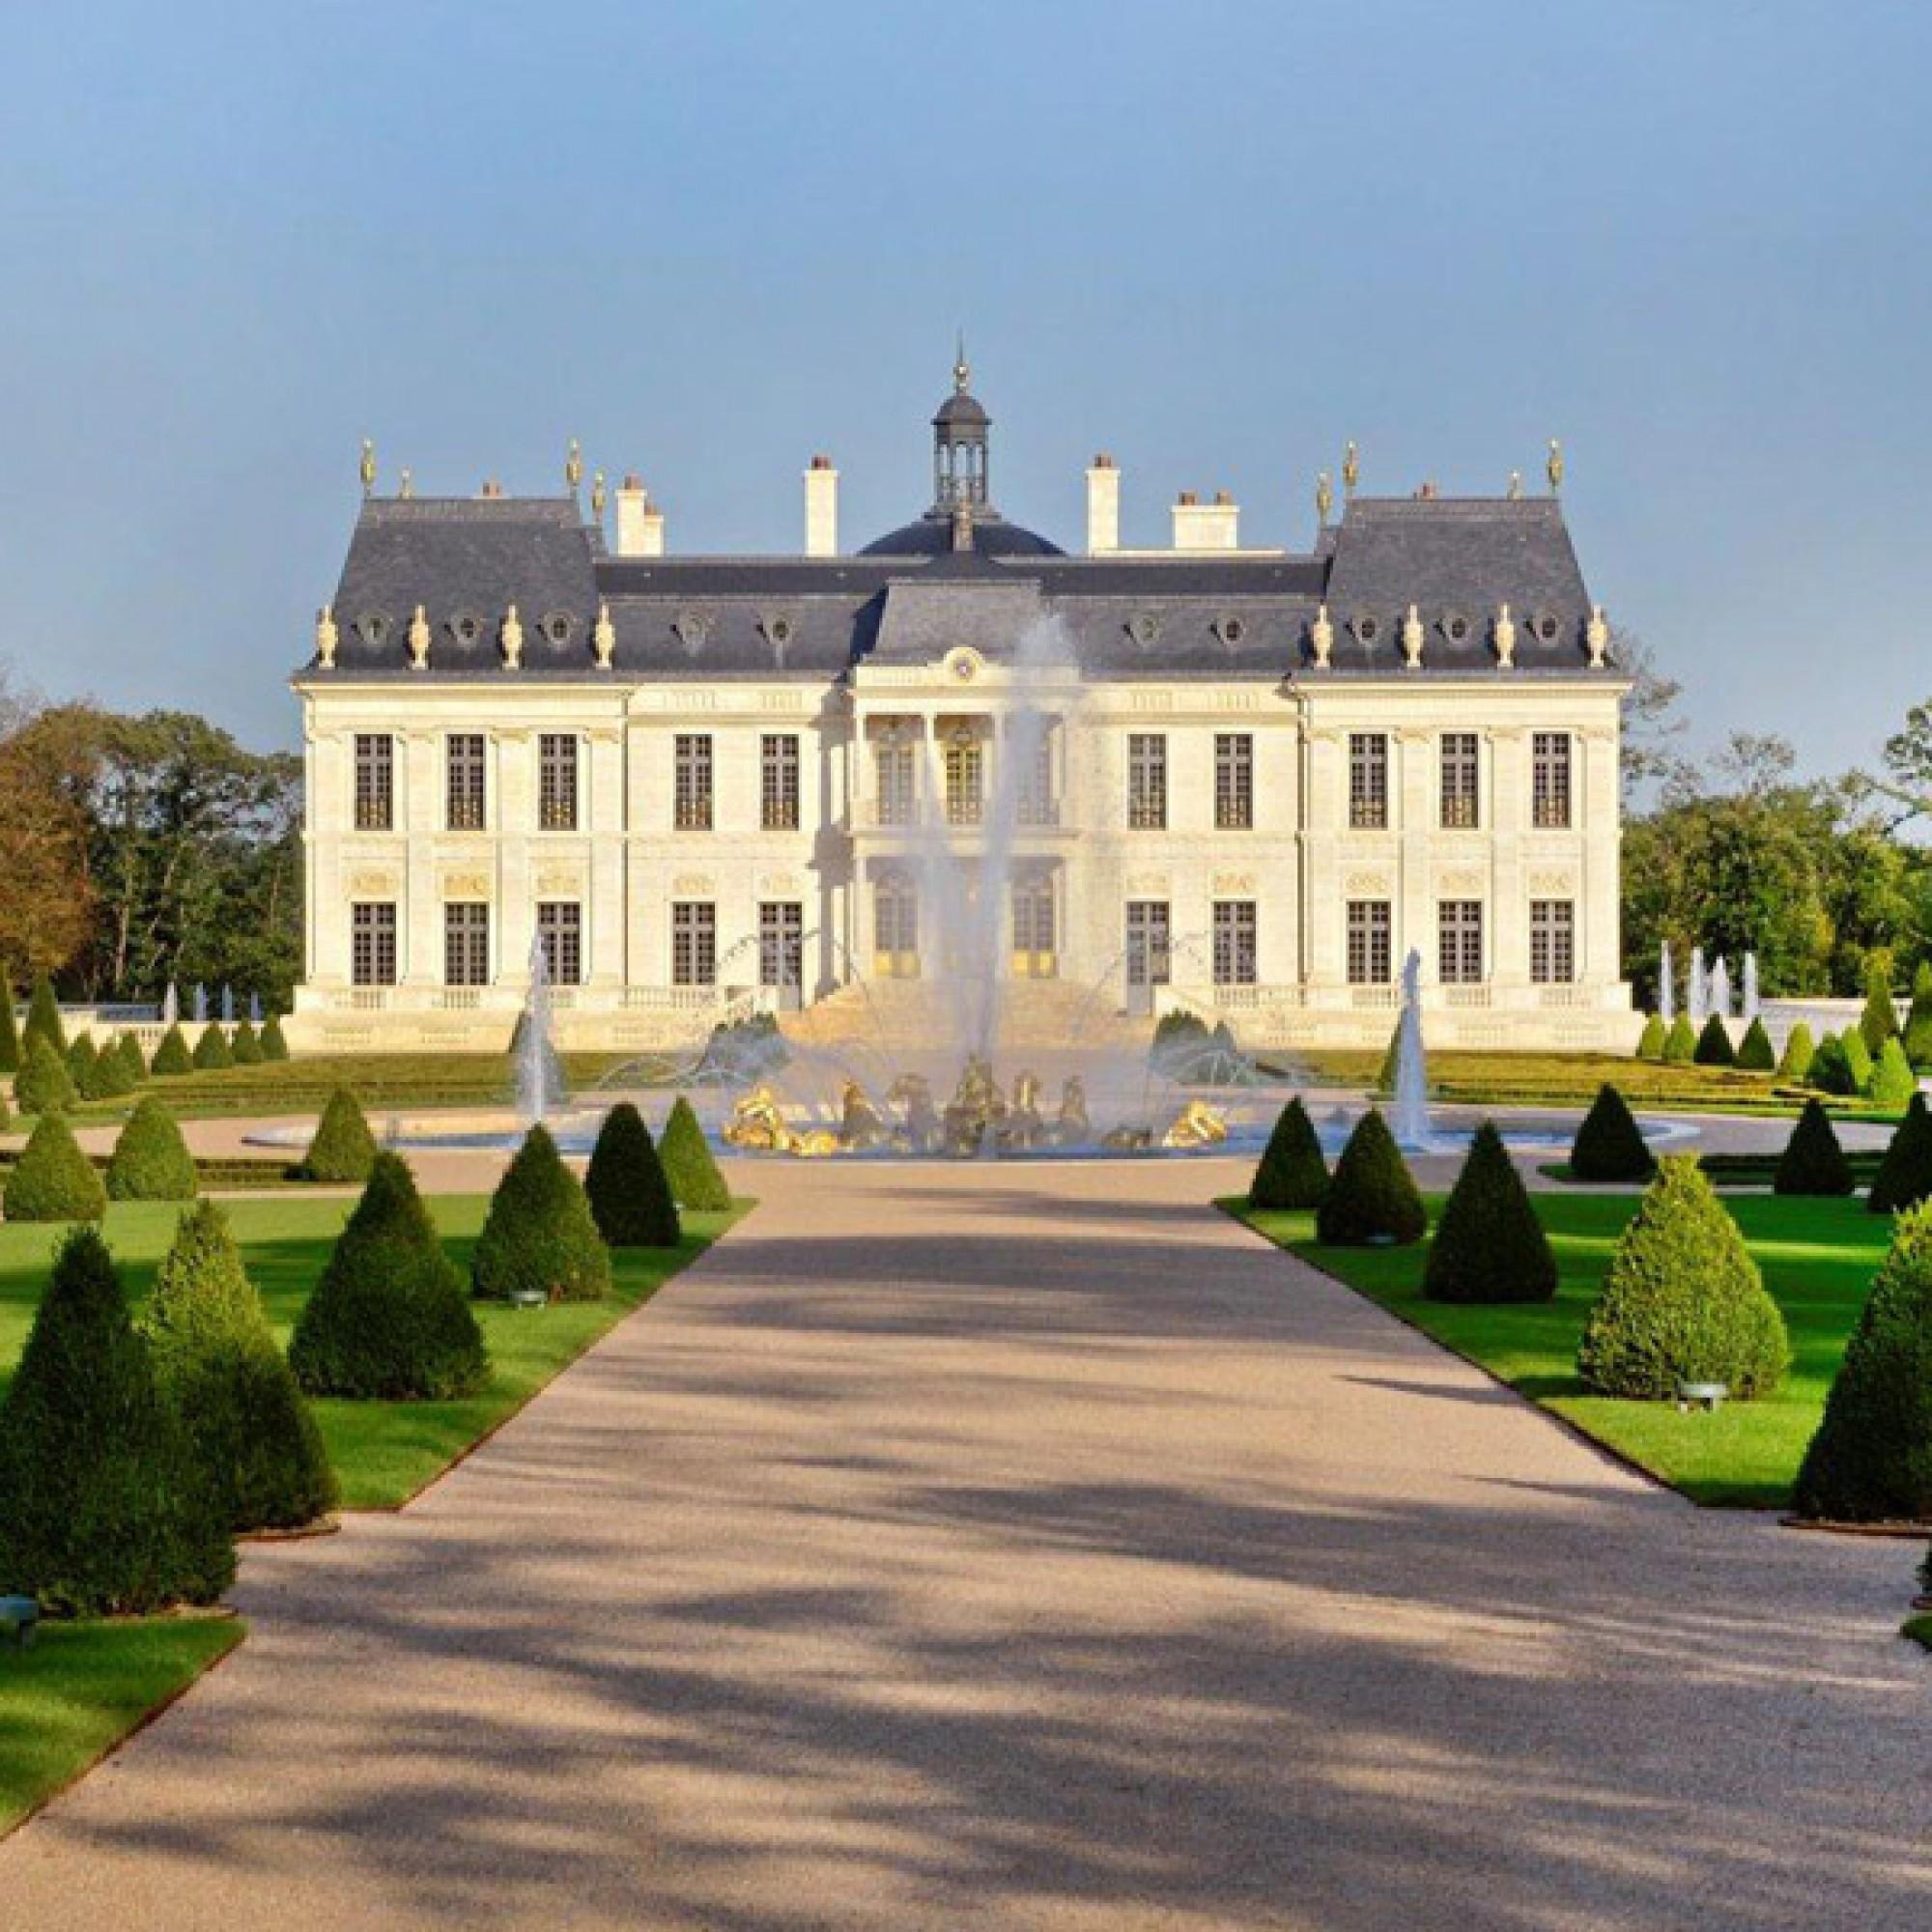 Château Louis XIV (Patrice Diaz, CC BY-SA 3.0, wikimedia.org)